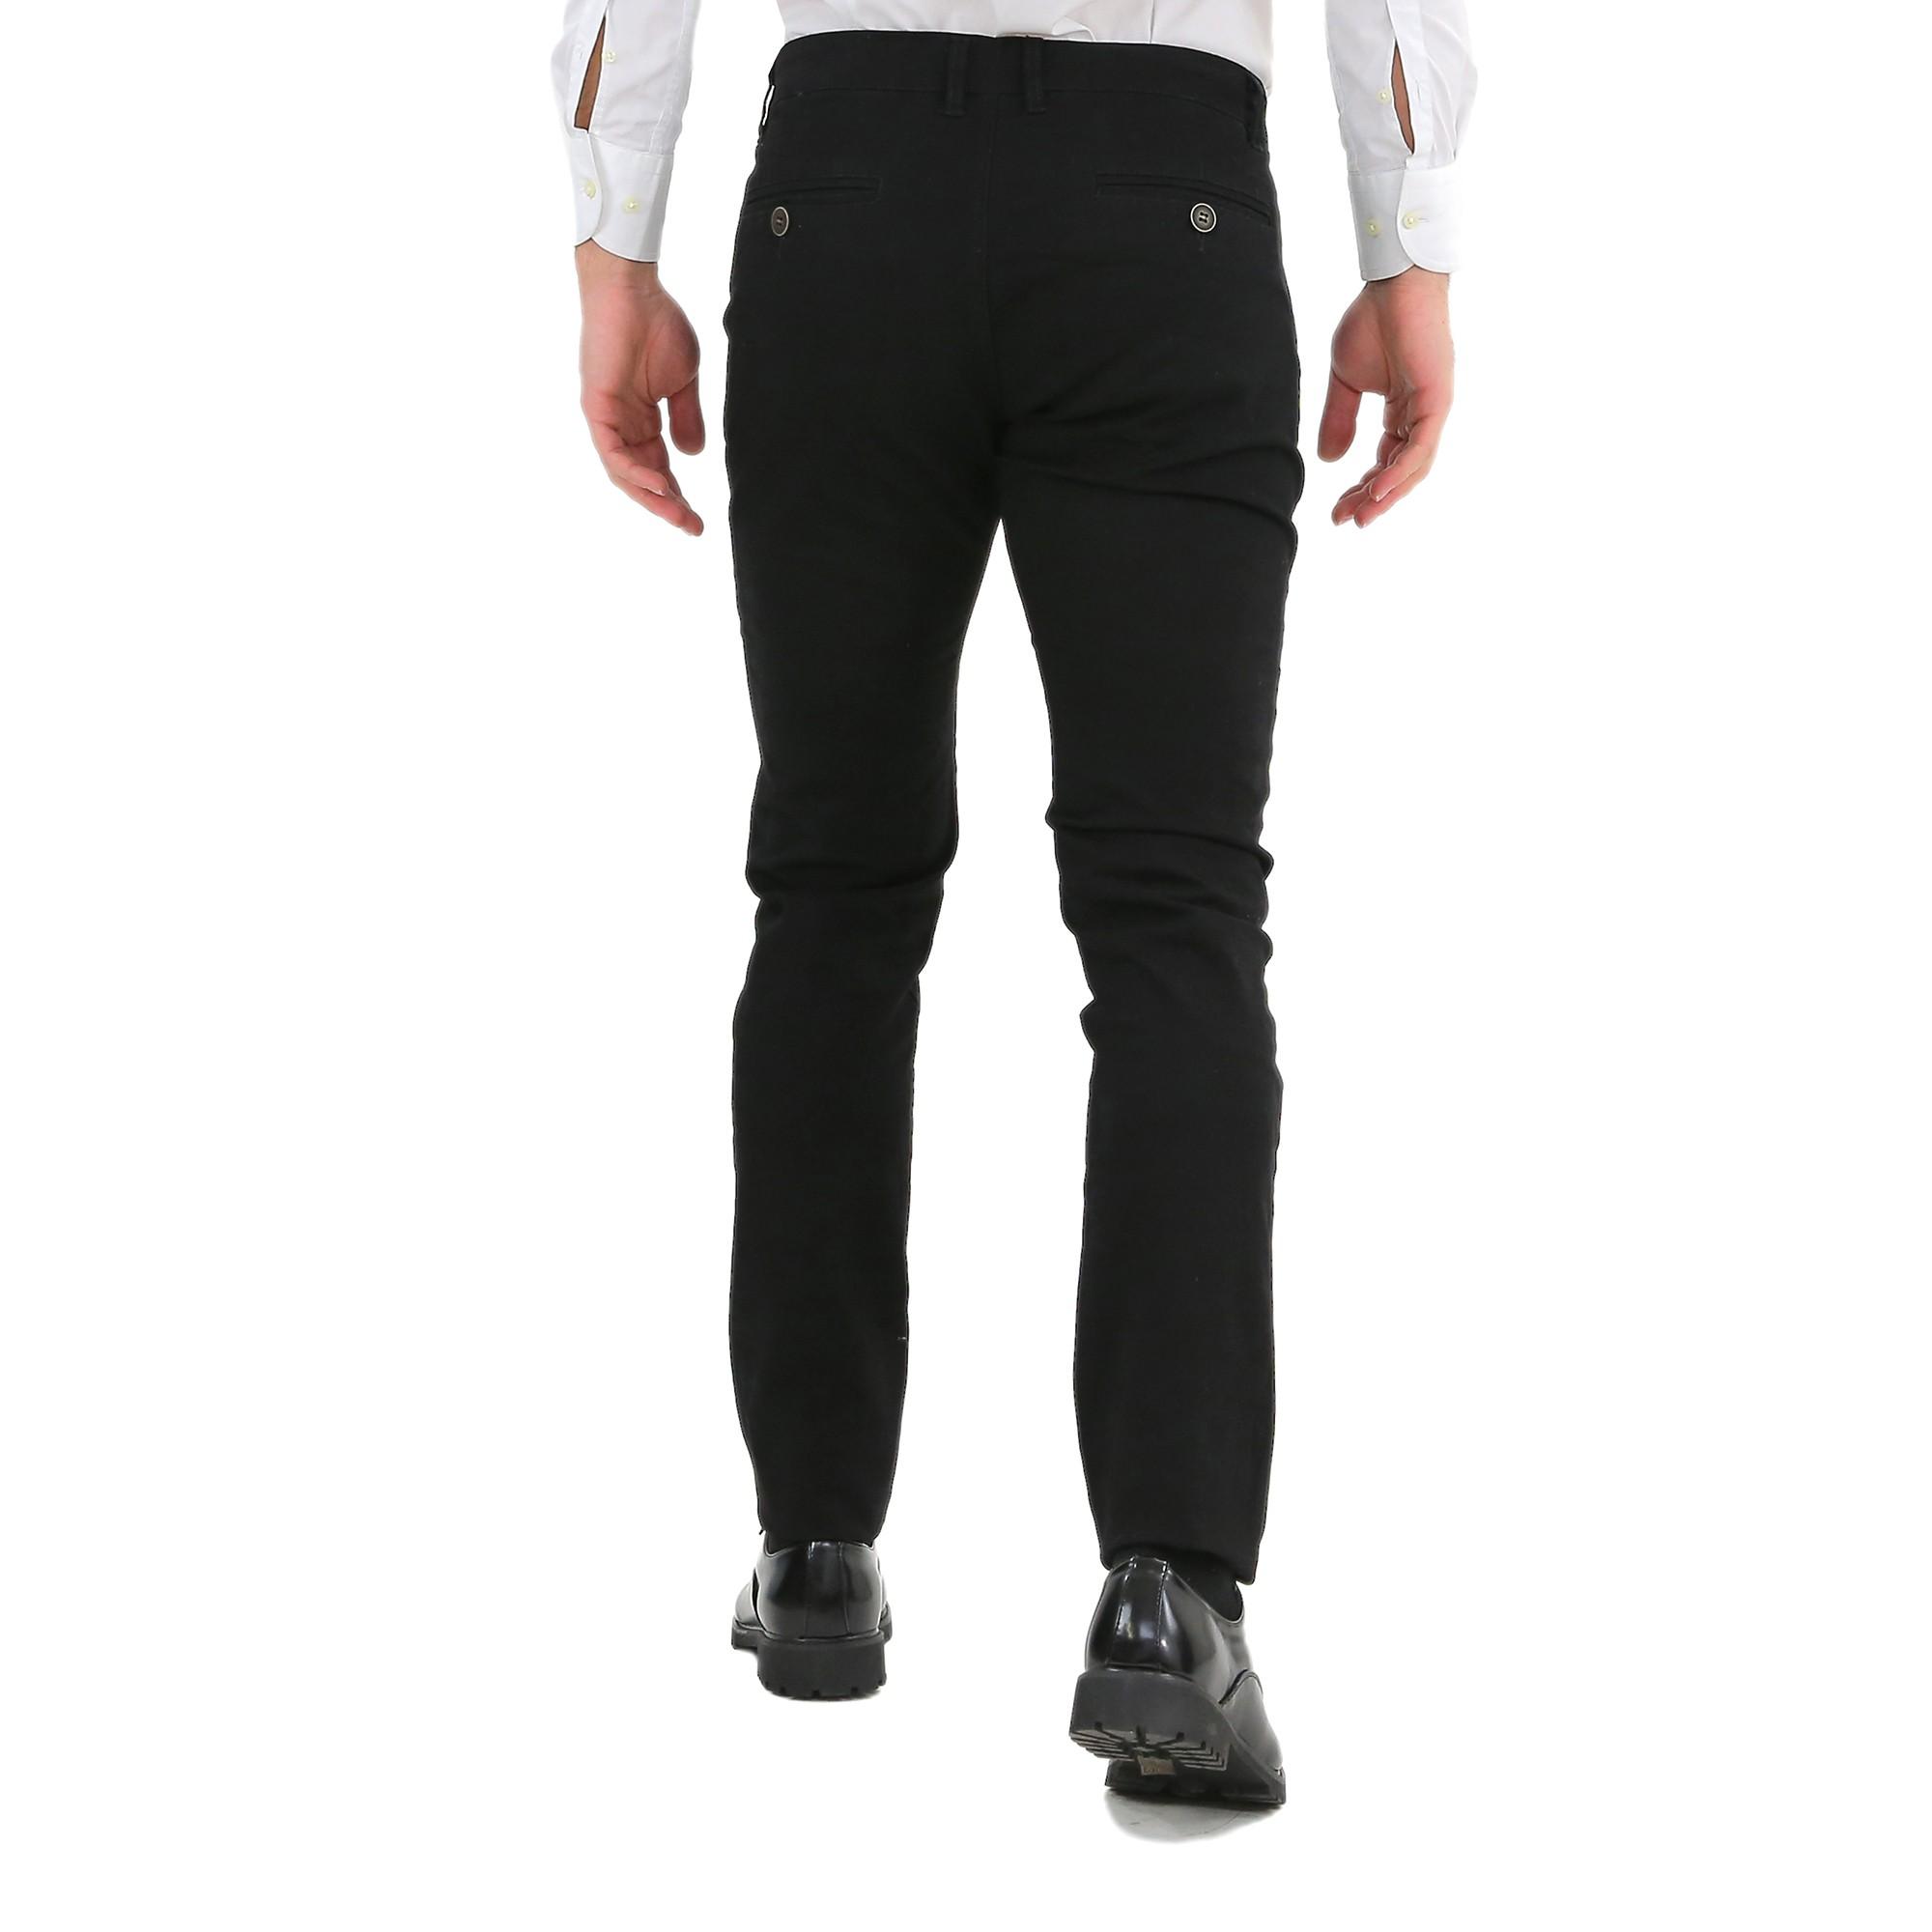 Pantaloni-Uomo-Slim-Fit-Eleganti-Invernali-Cargo-Classico-Chino-Kaki-Tasca-Ameri miniatura 7